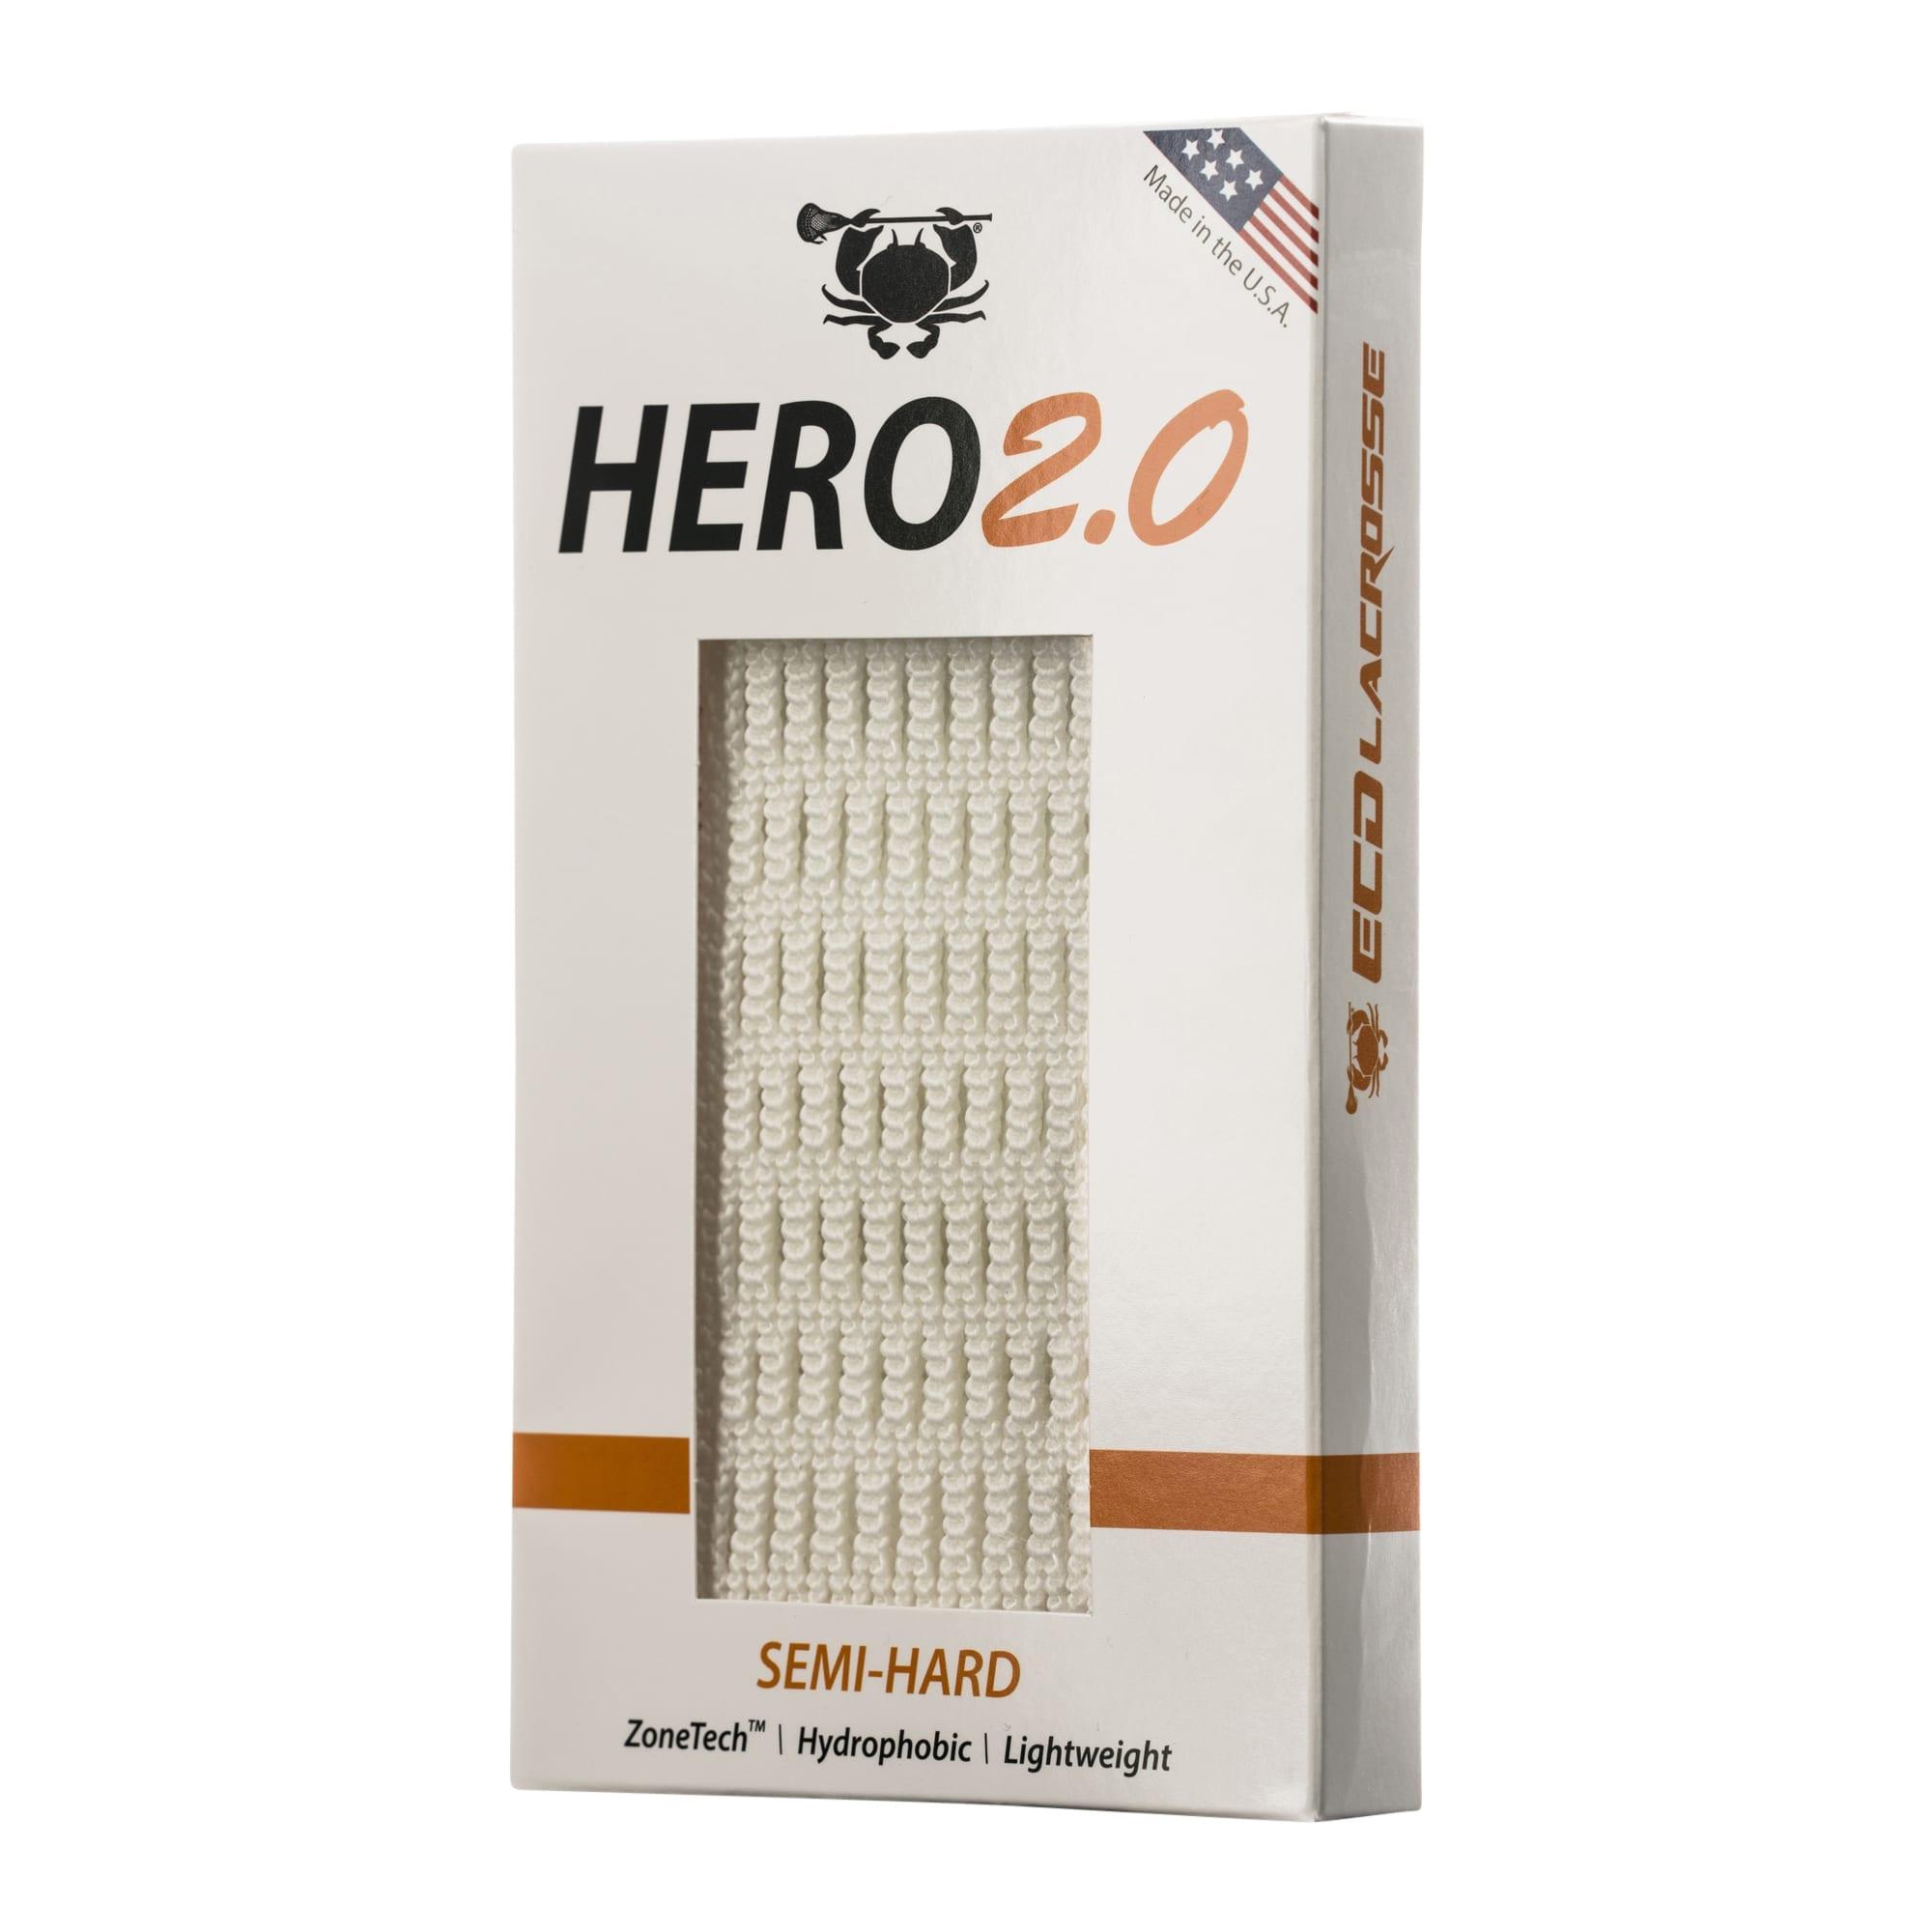 Hero2.0-White-SemiHard-Alt-1.jpg